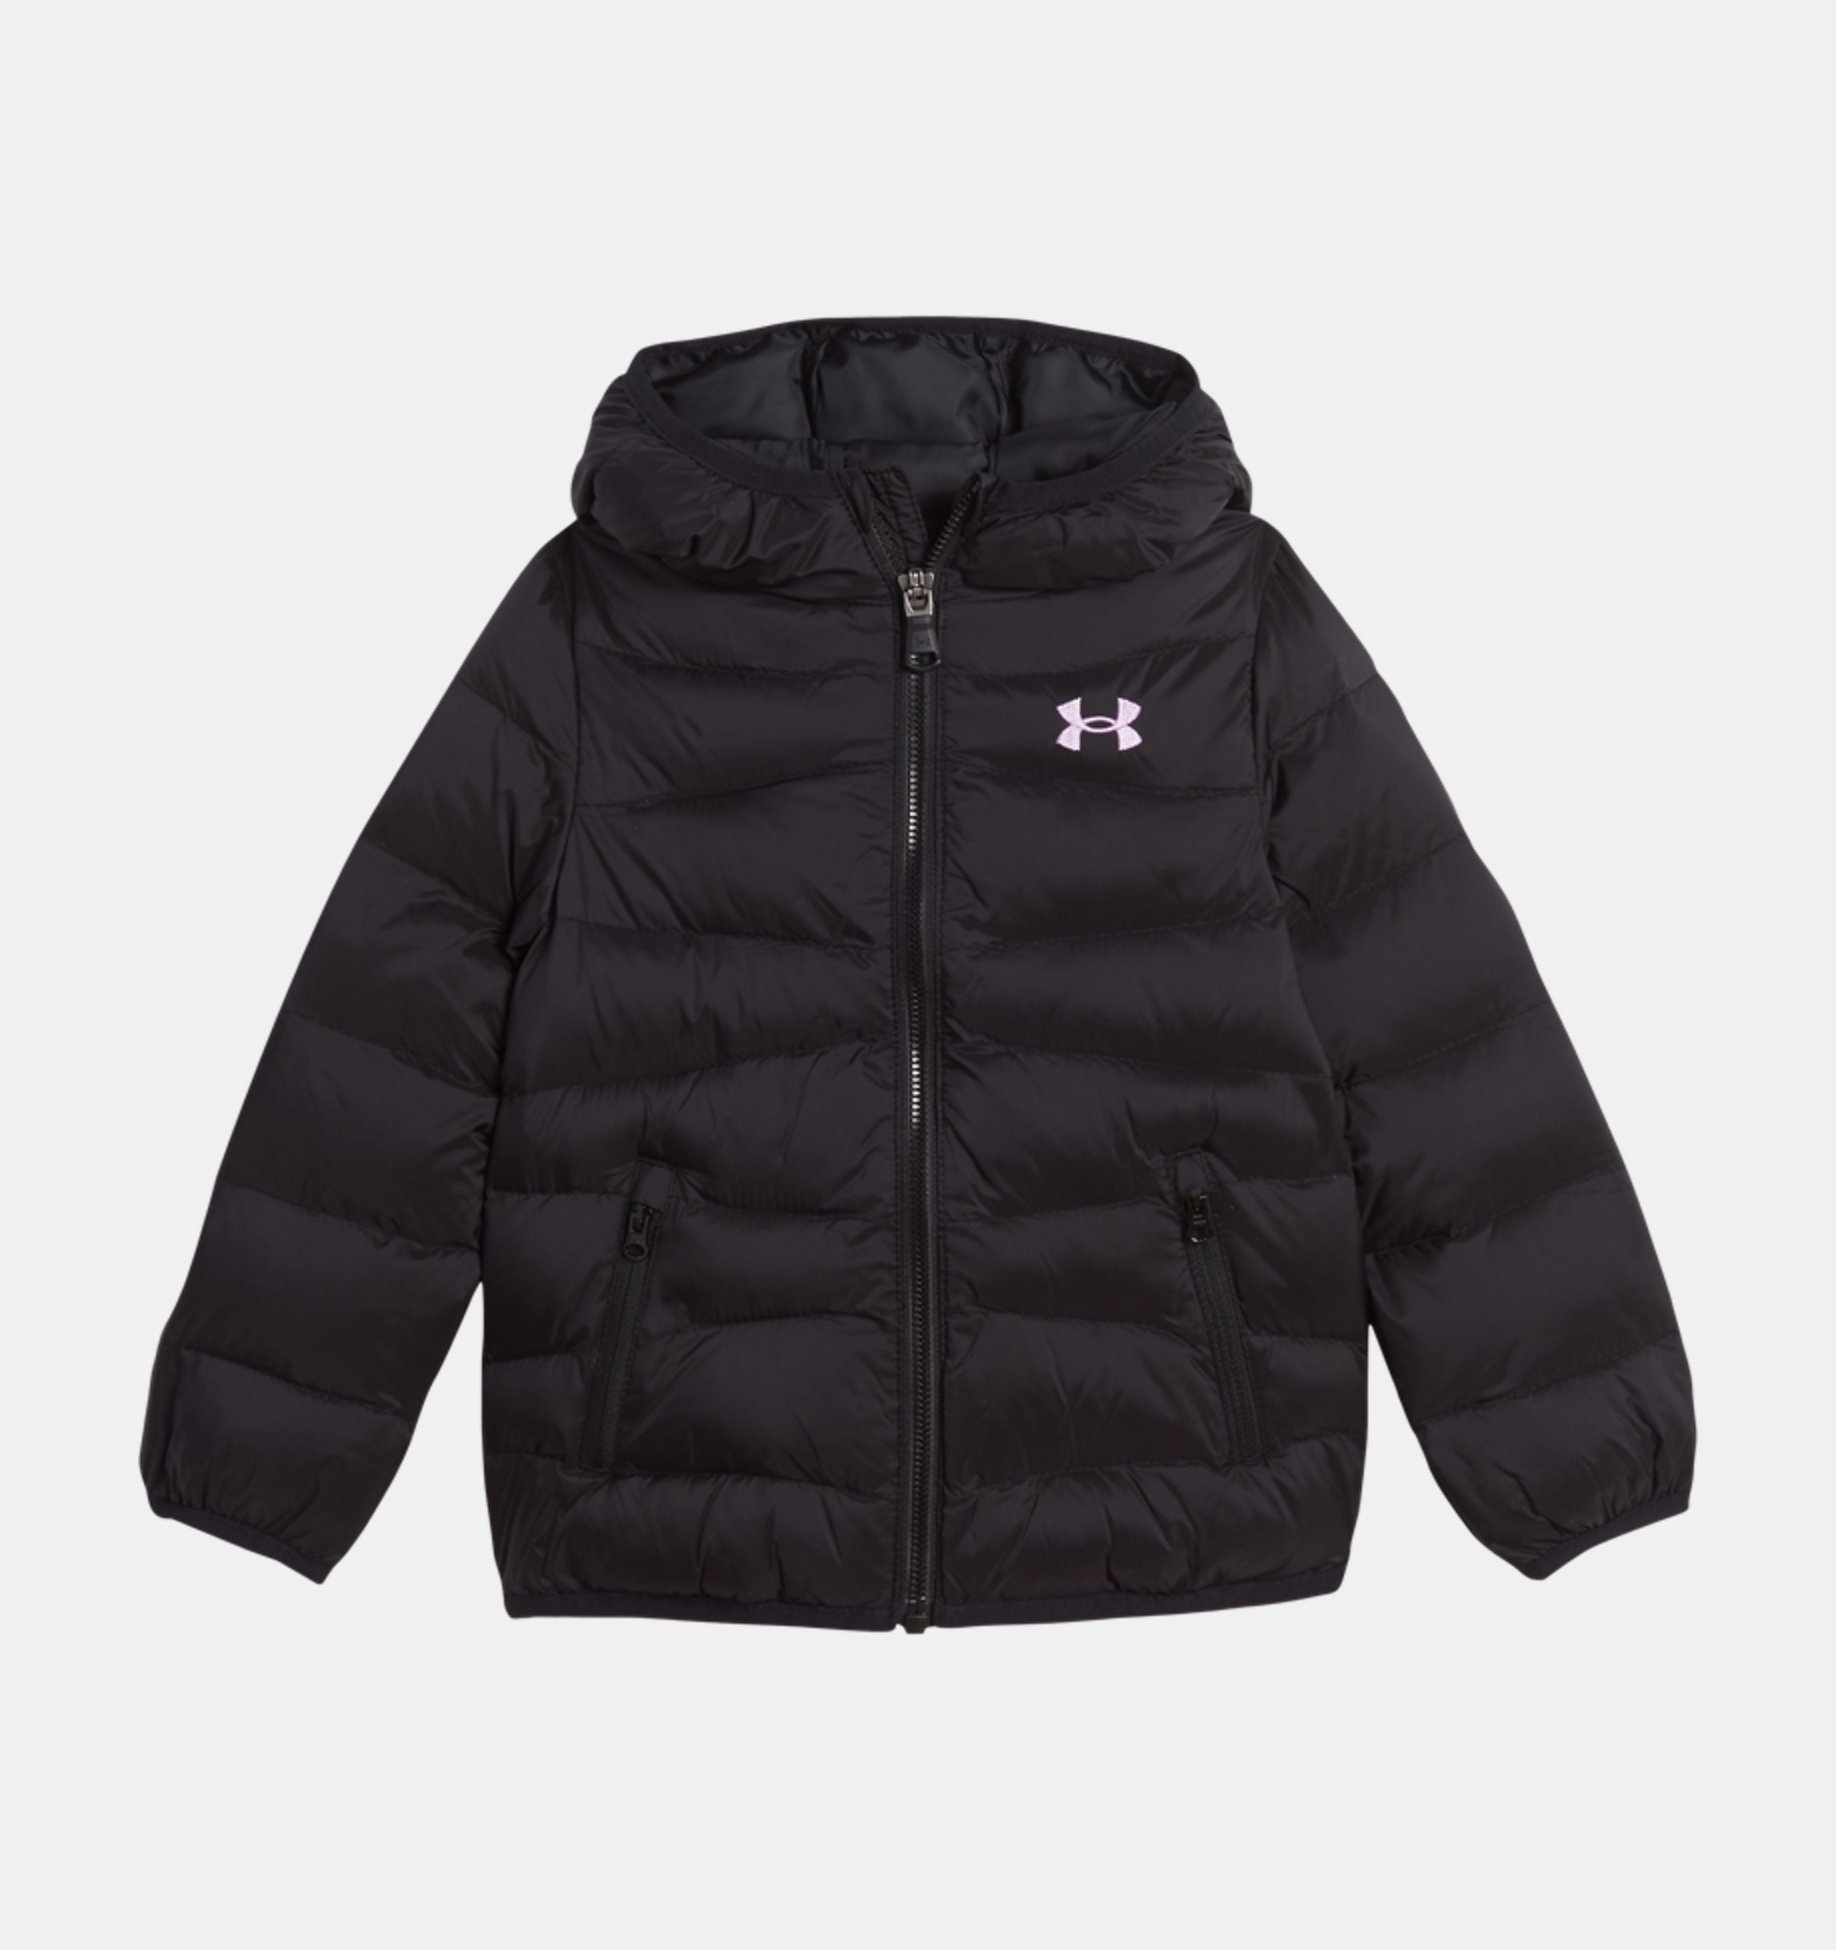 Underarmour Girls Toddler UA Prime Puffer Jacket